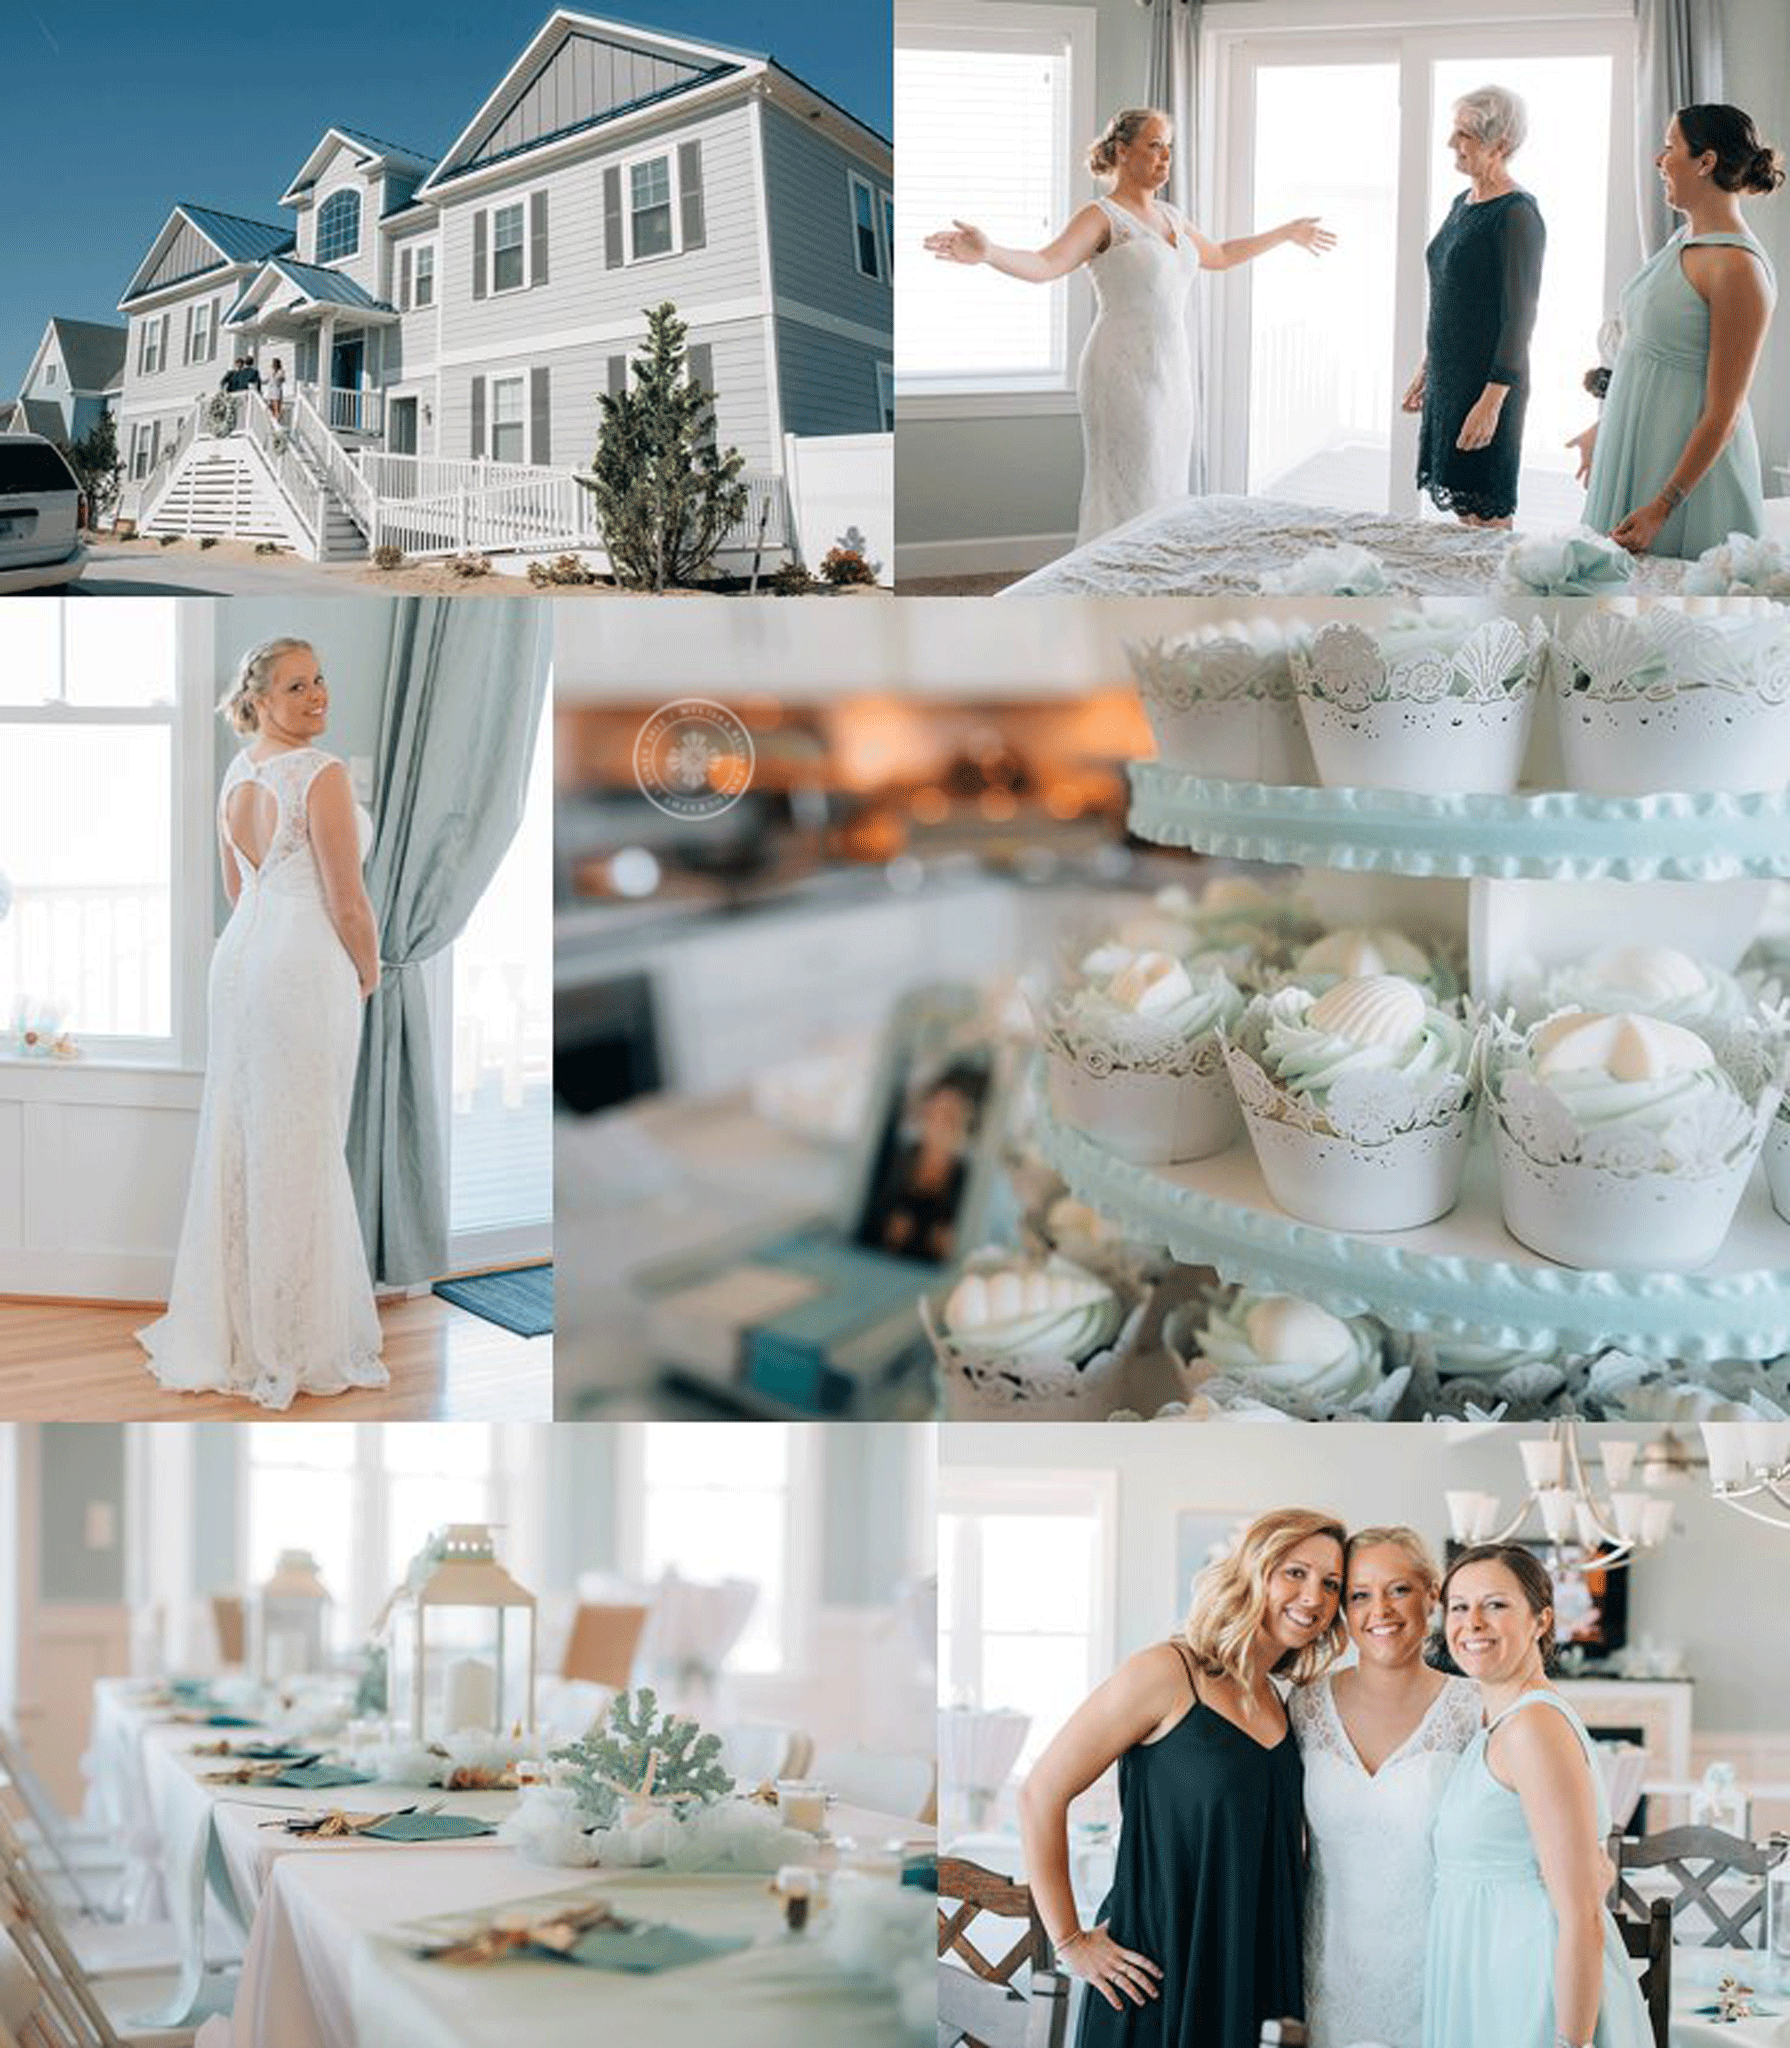 virginia-beach-wedding-photographer-melissa-bliss-photography-sandbridge-beach-cottage-wedding-photography-norfolk-portsmouth-chesapeake-wedding-photographers-melissa-bliss-photography.png